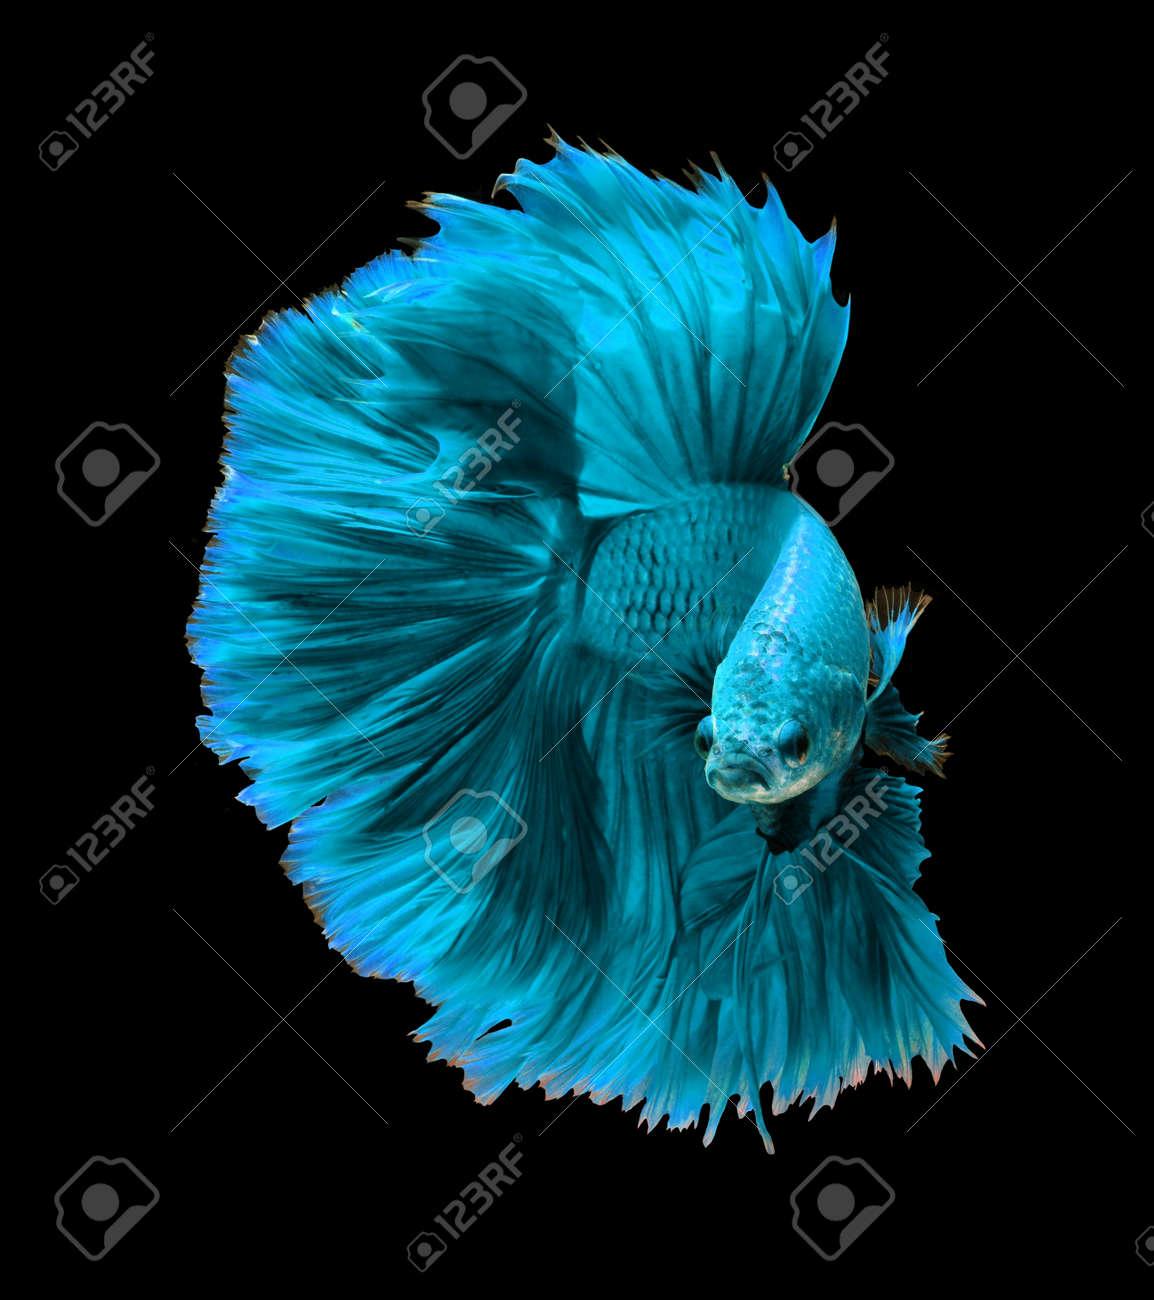 blue turquoise dragon siamese fighting fish betta fish isolated